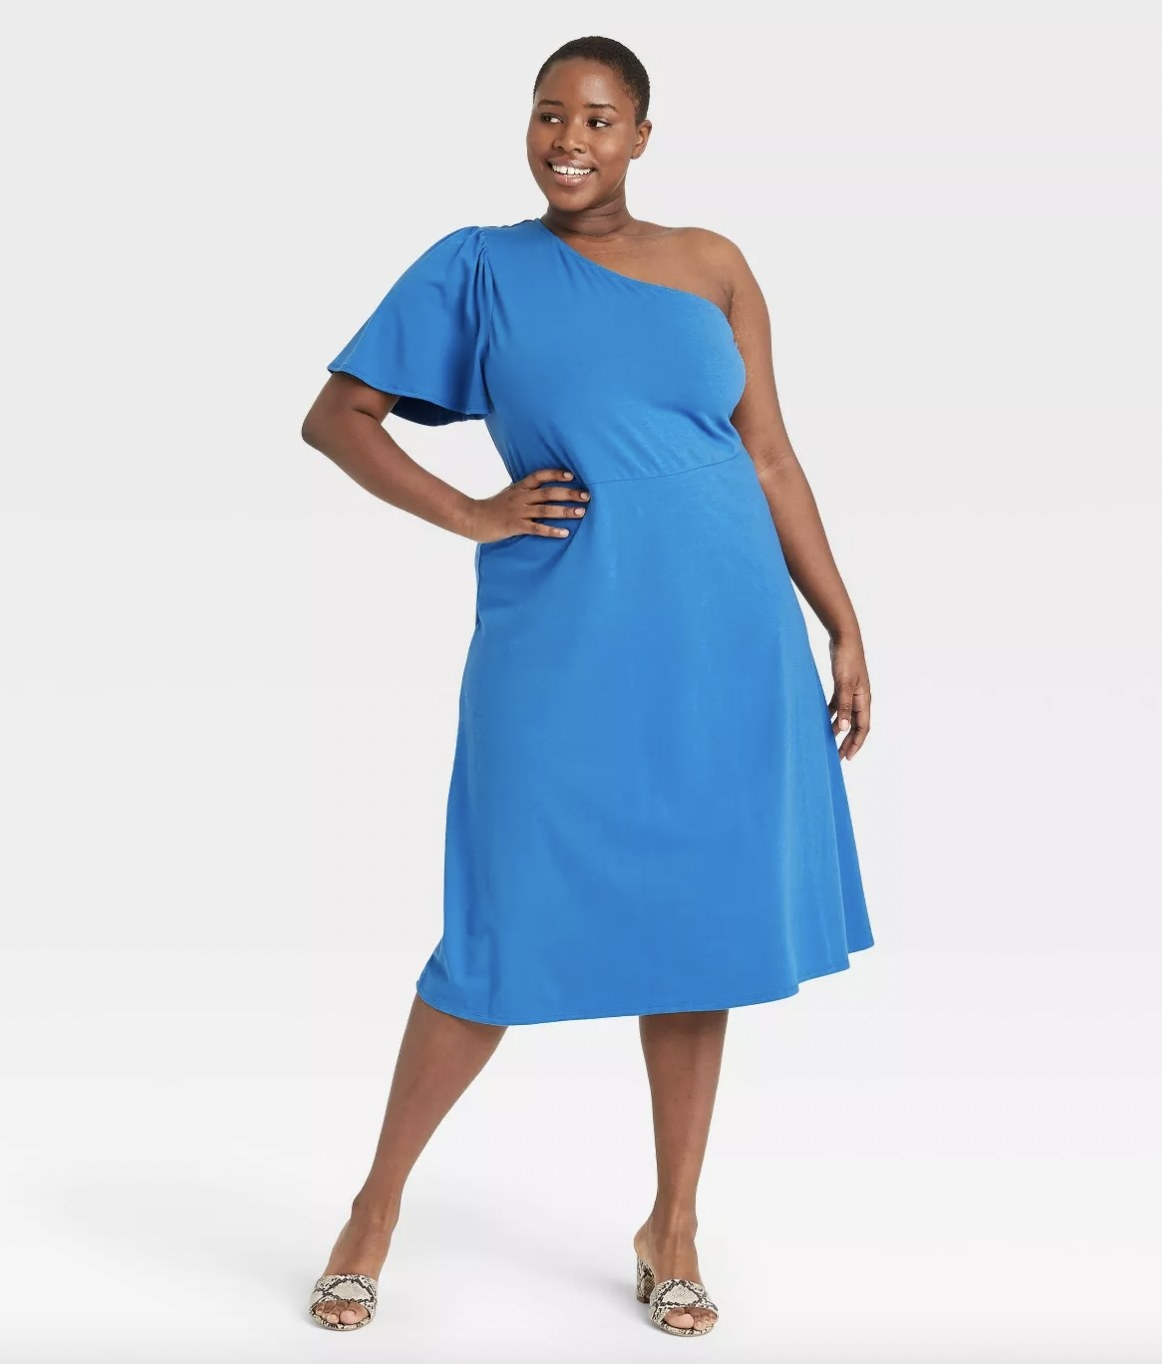 A woman wearing a blue one-shoulder dress